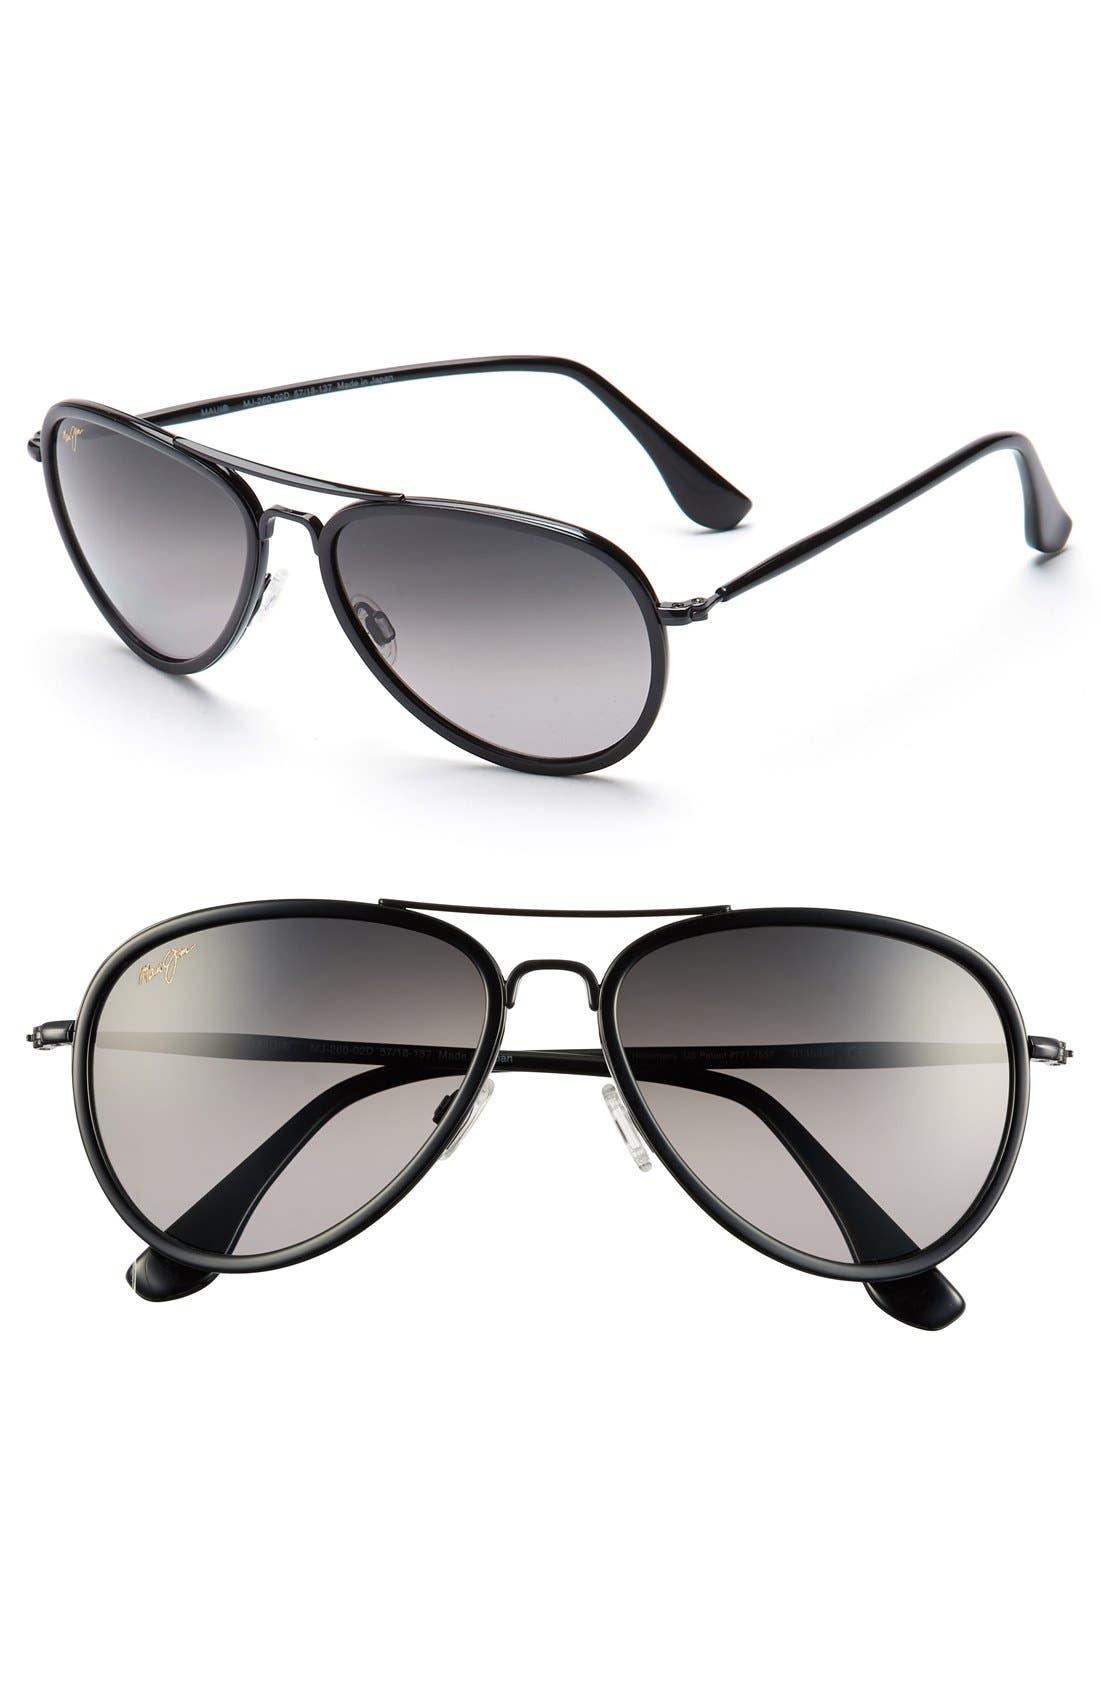 Alternate Image 1 Selected - Maui Jim 'Honomanu' 57mm PolarizedPlus®2 Sunglasses